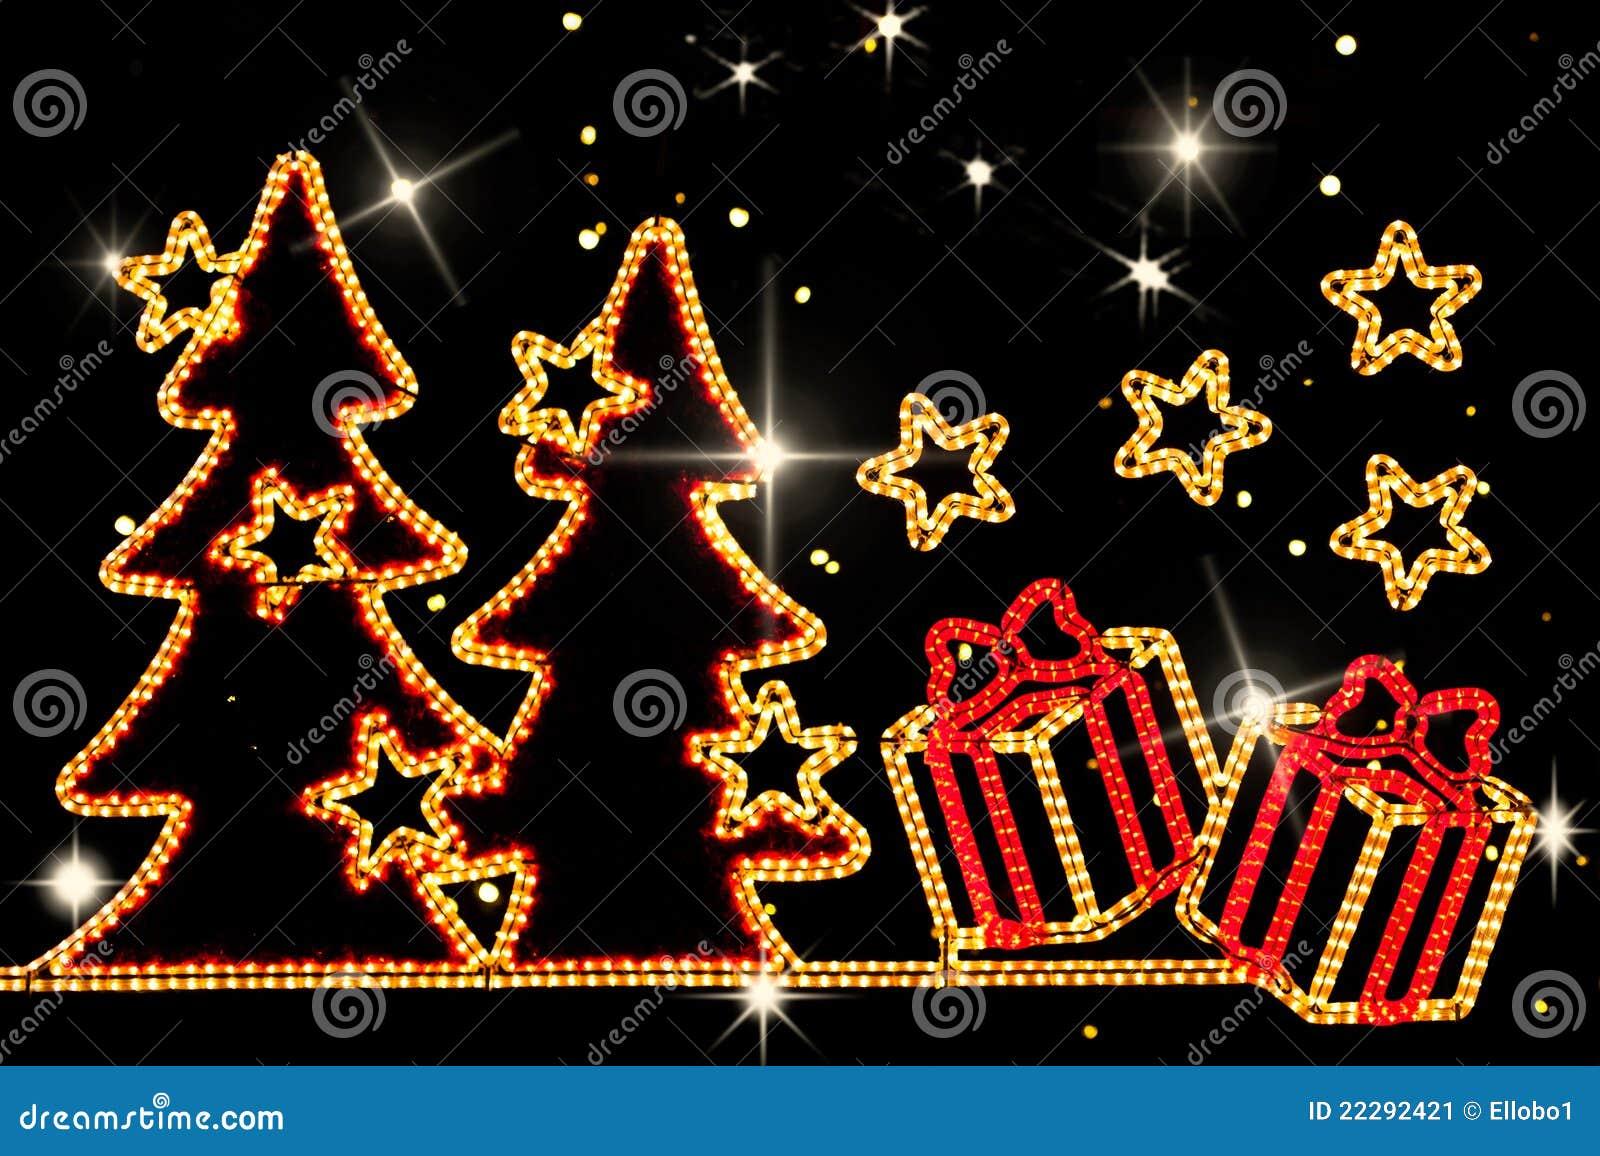 download christmas neon lights stock image image of abstract 22292421